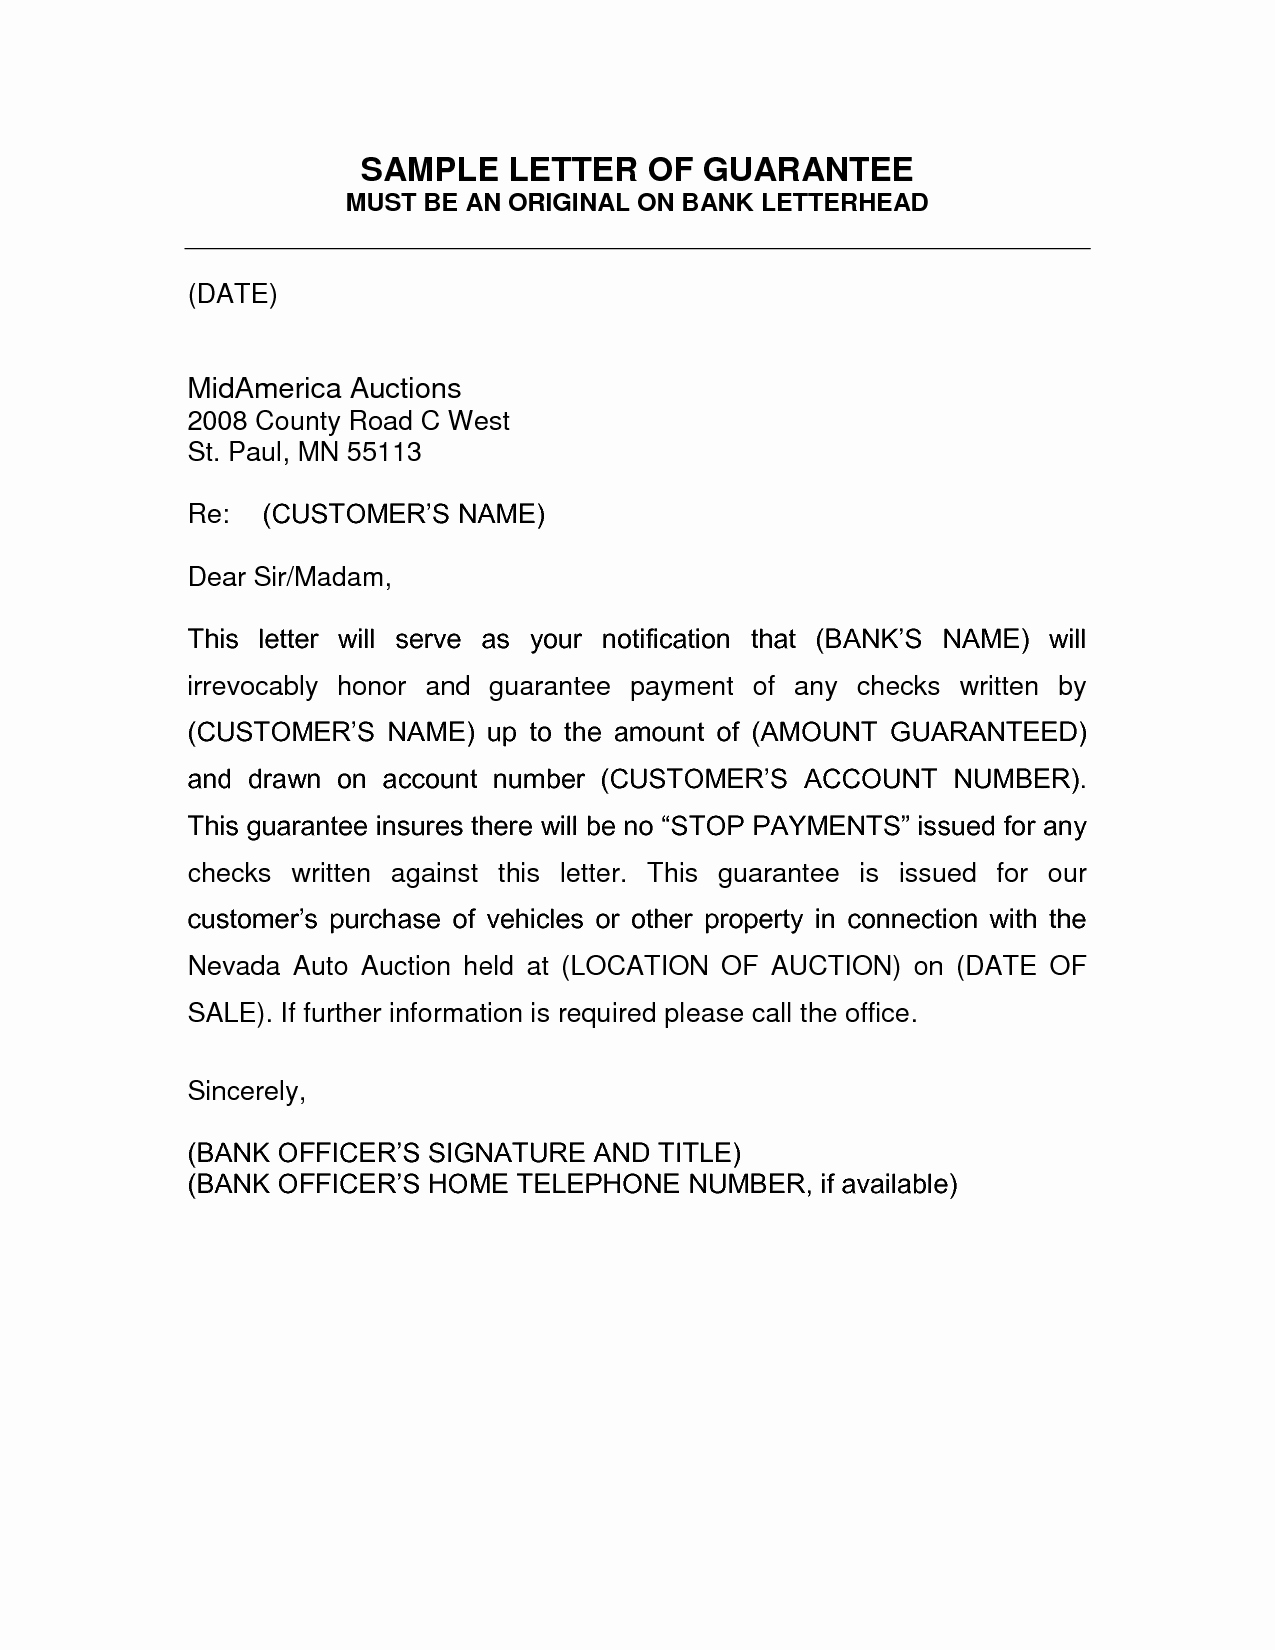 Letter Of Guarantee Template Fresh Letter Of Guarantee Template Auto Title – Aktin